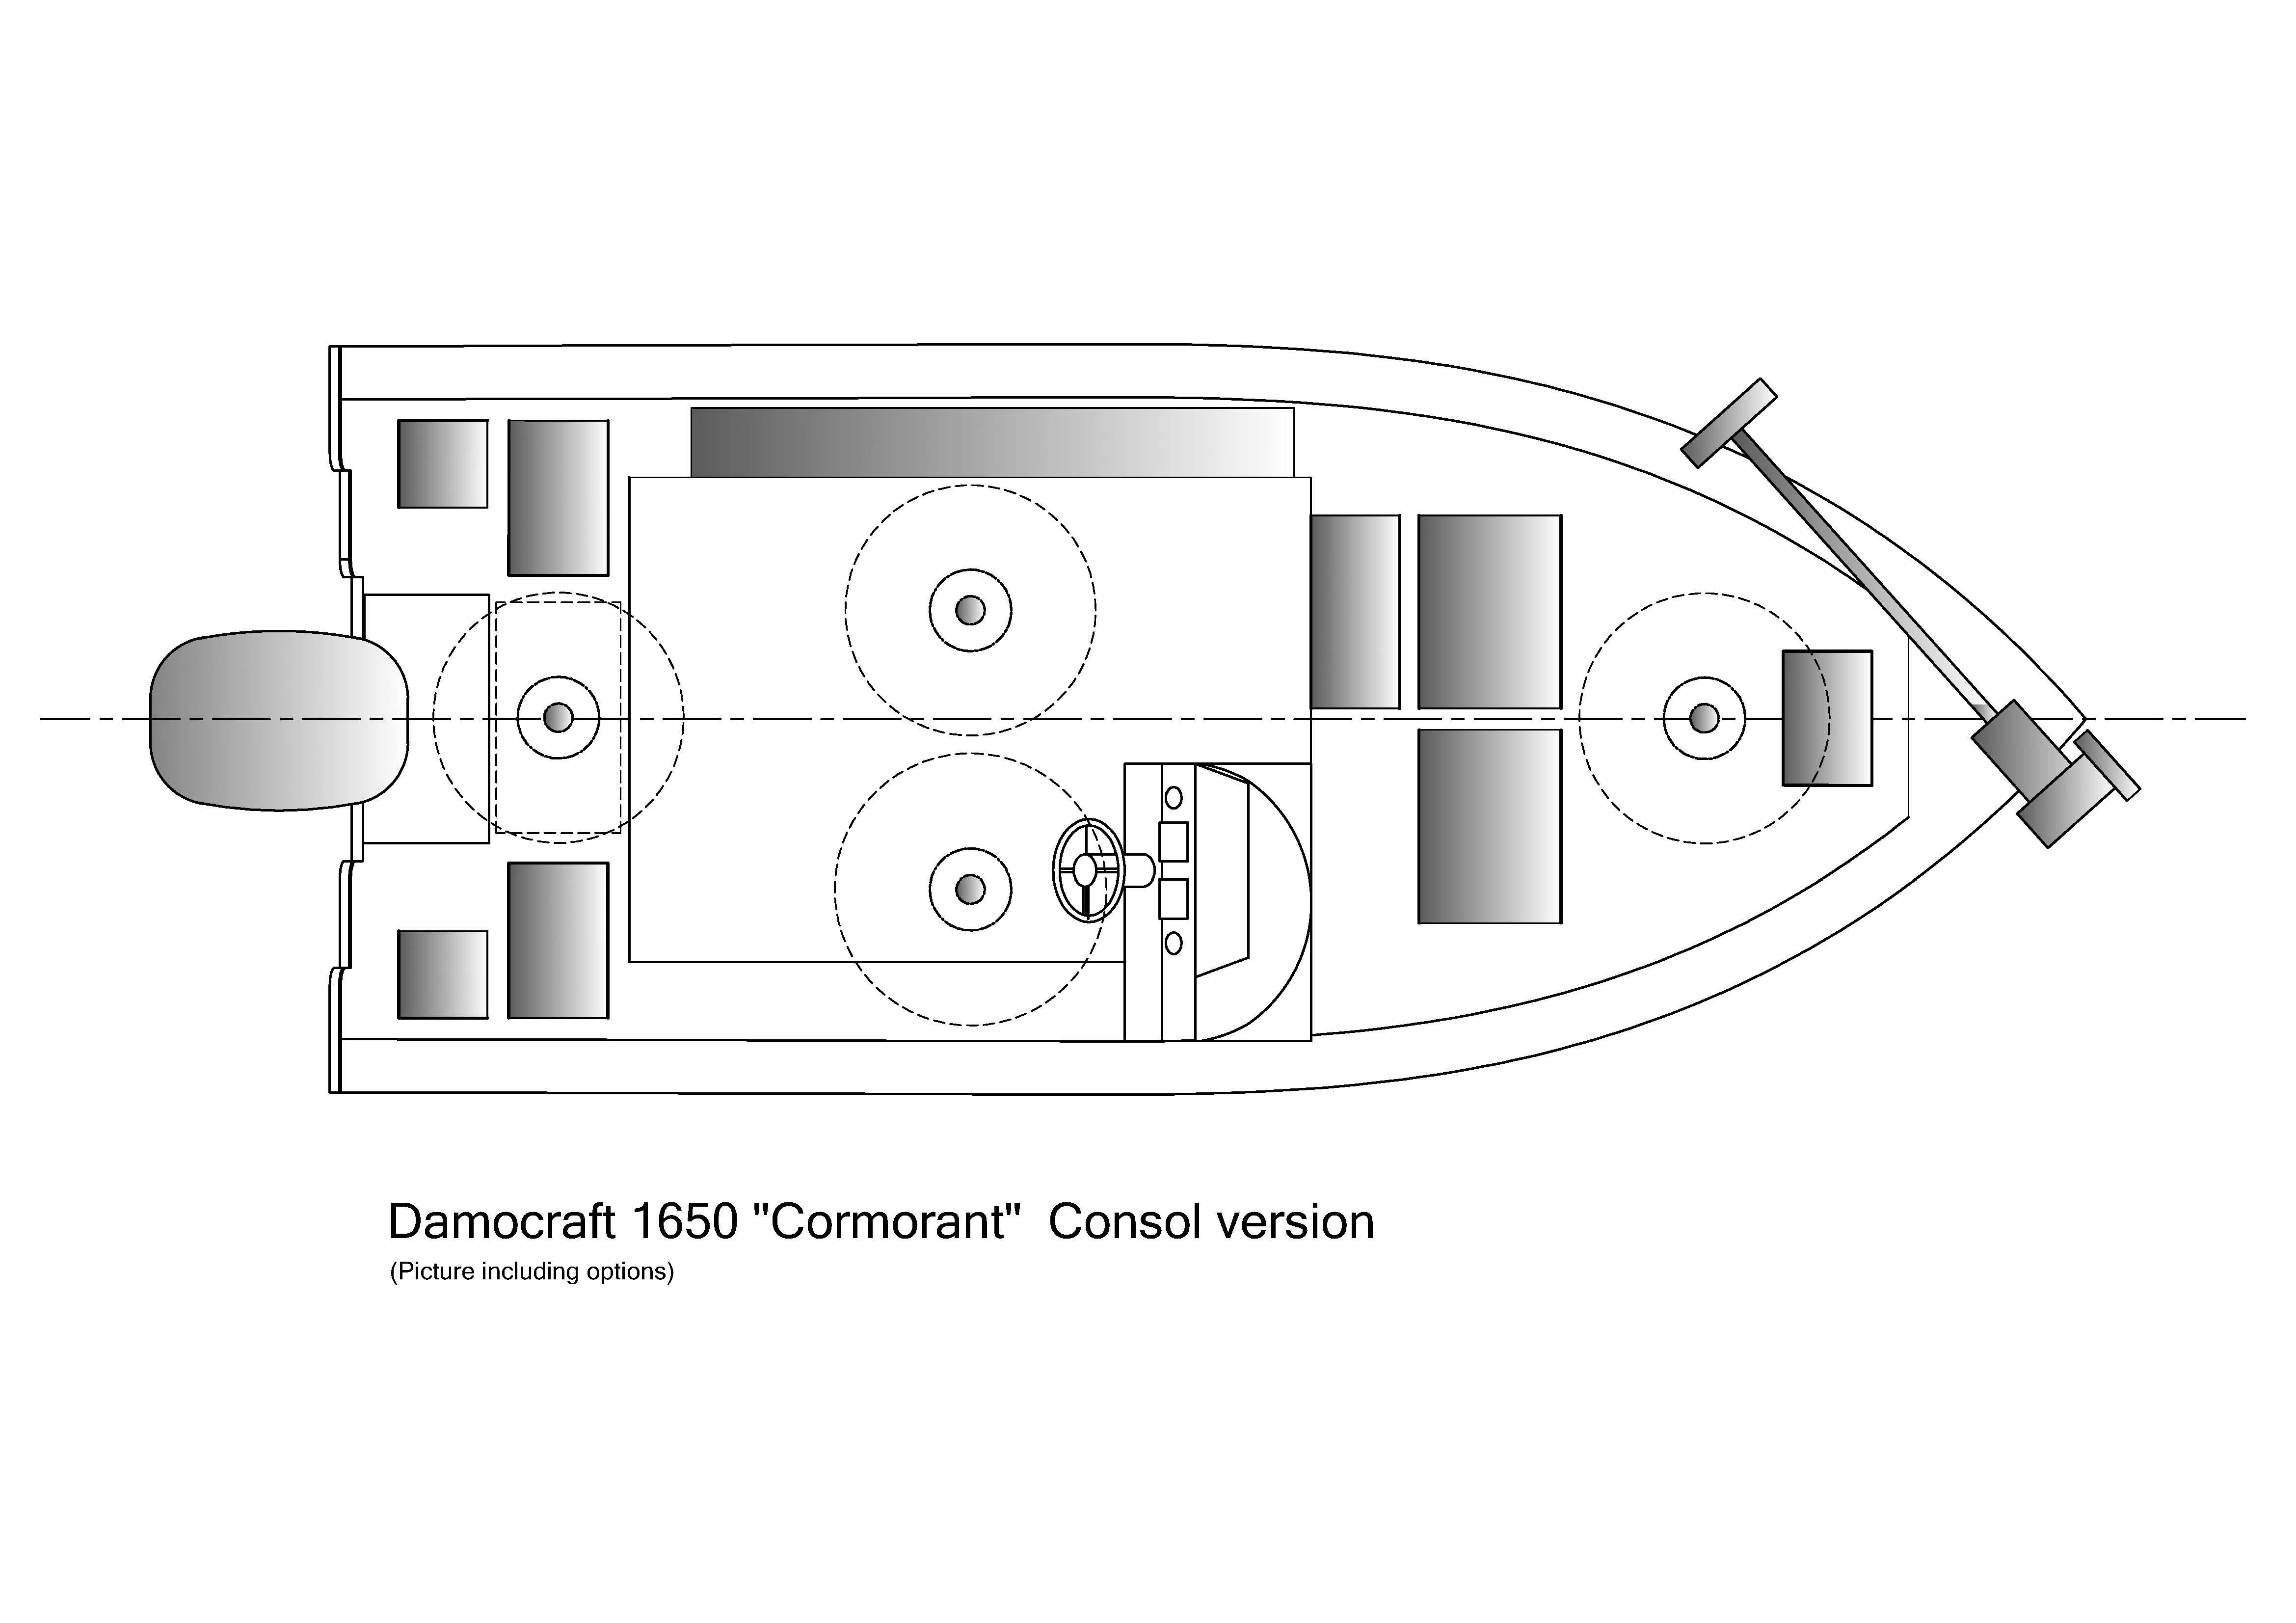 Damocraft 1650 Cormorant Consol version